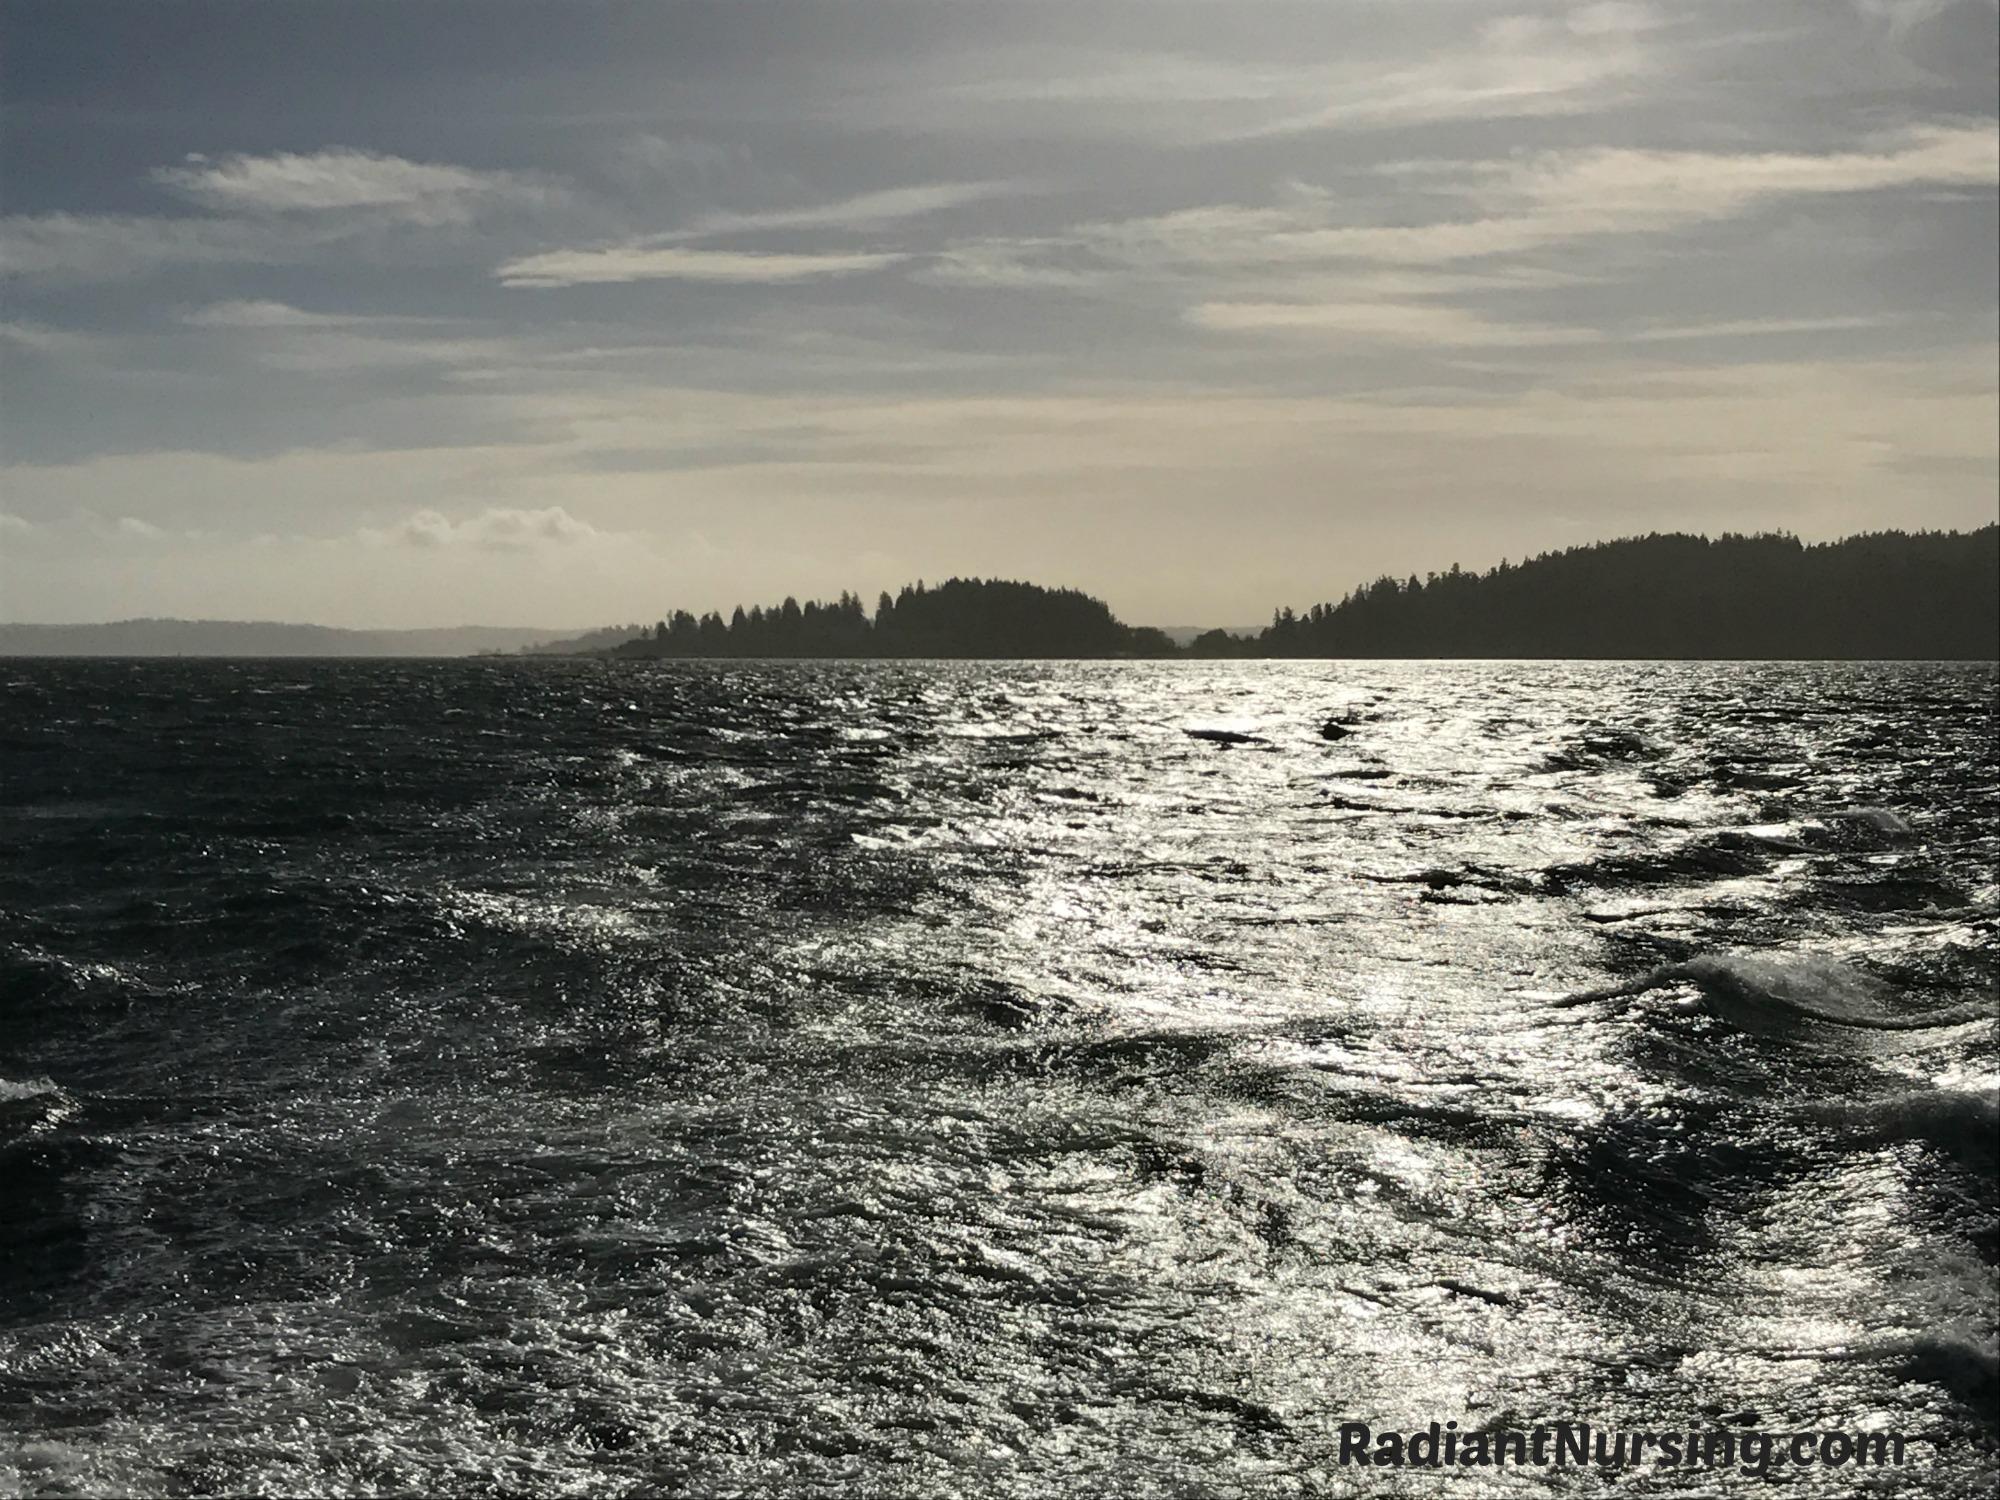 Sunlight sparkles on Puget Sound during a sun break.